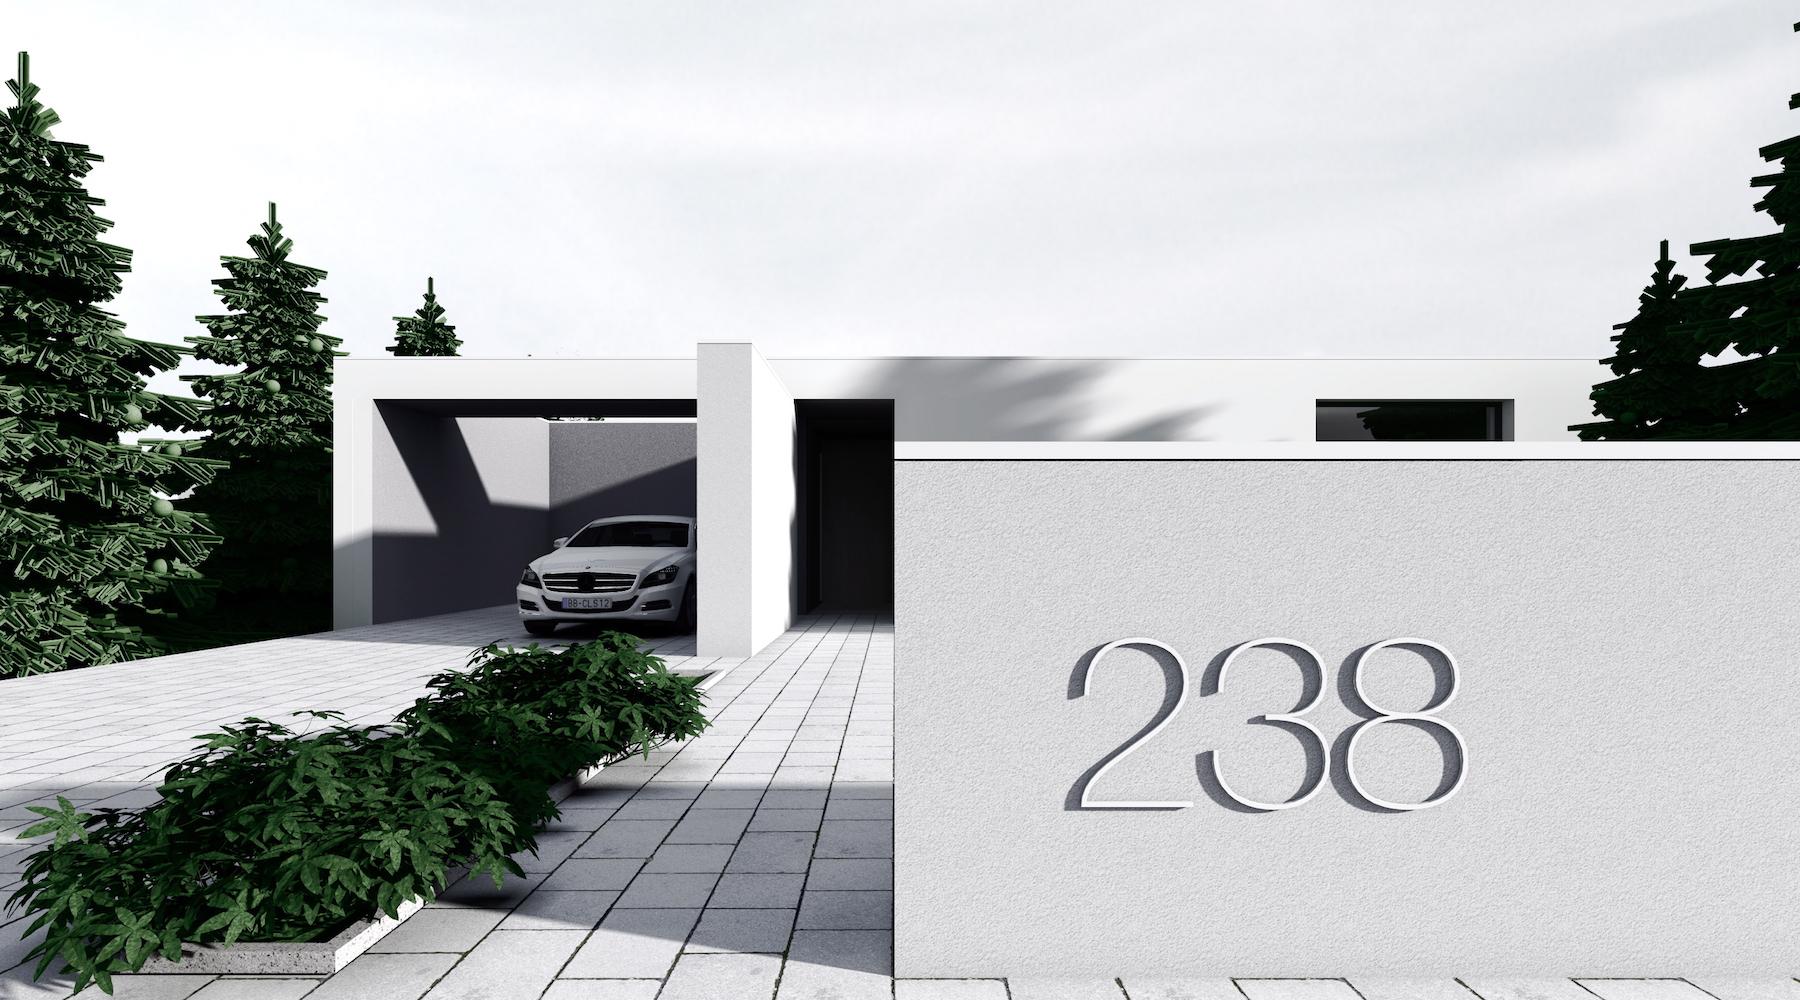 architekt_lodz_pv_house_inuti_02